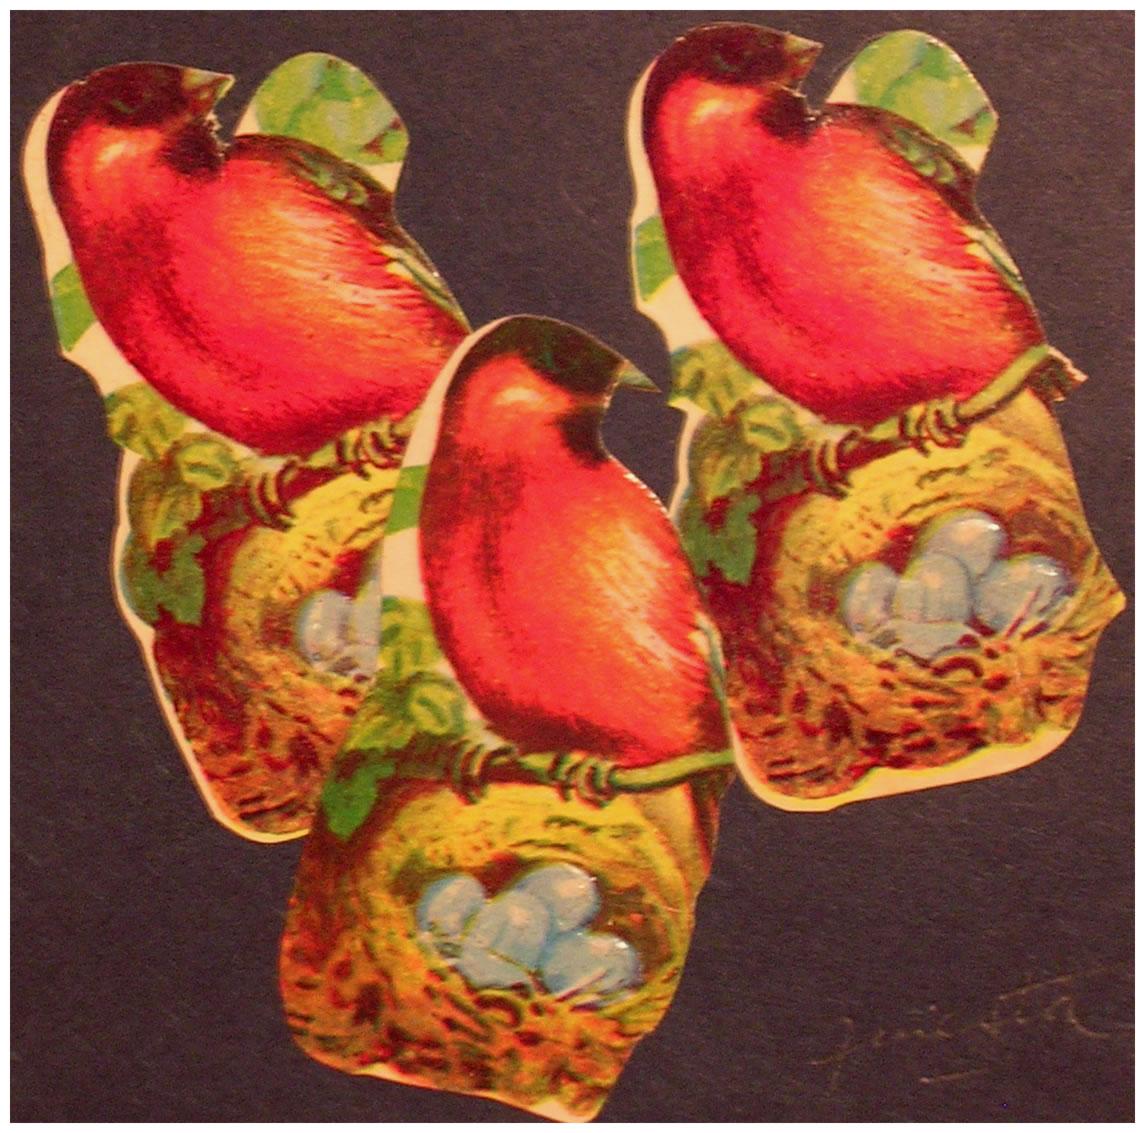 Tres,  papel collage, 15 cm x 15 cm, 1999